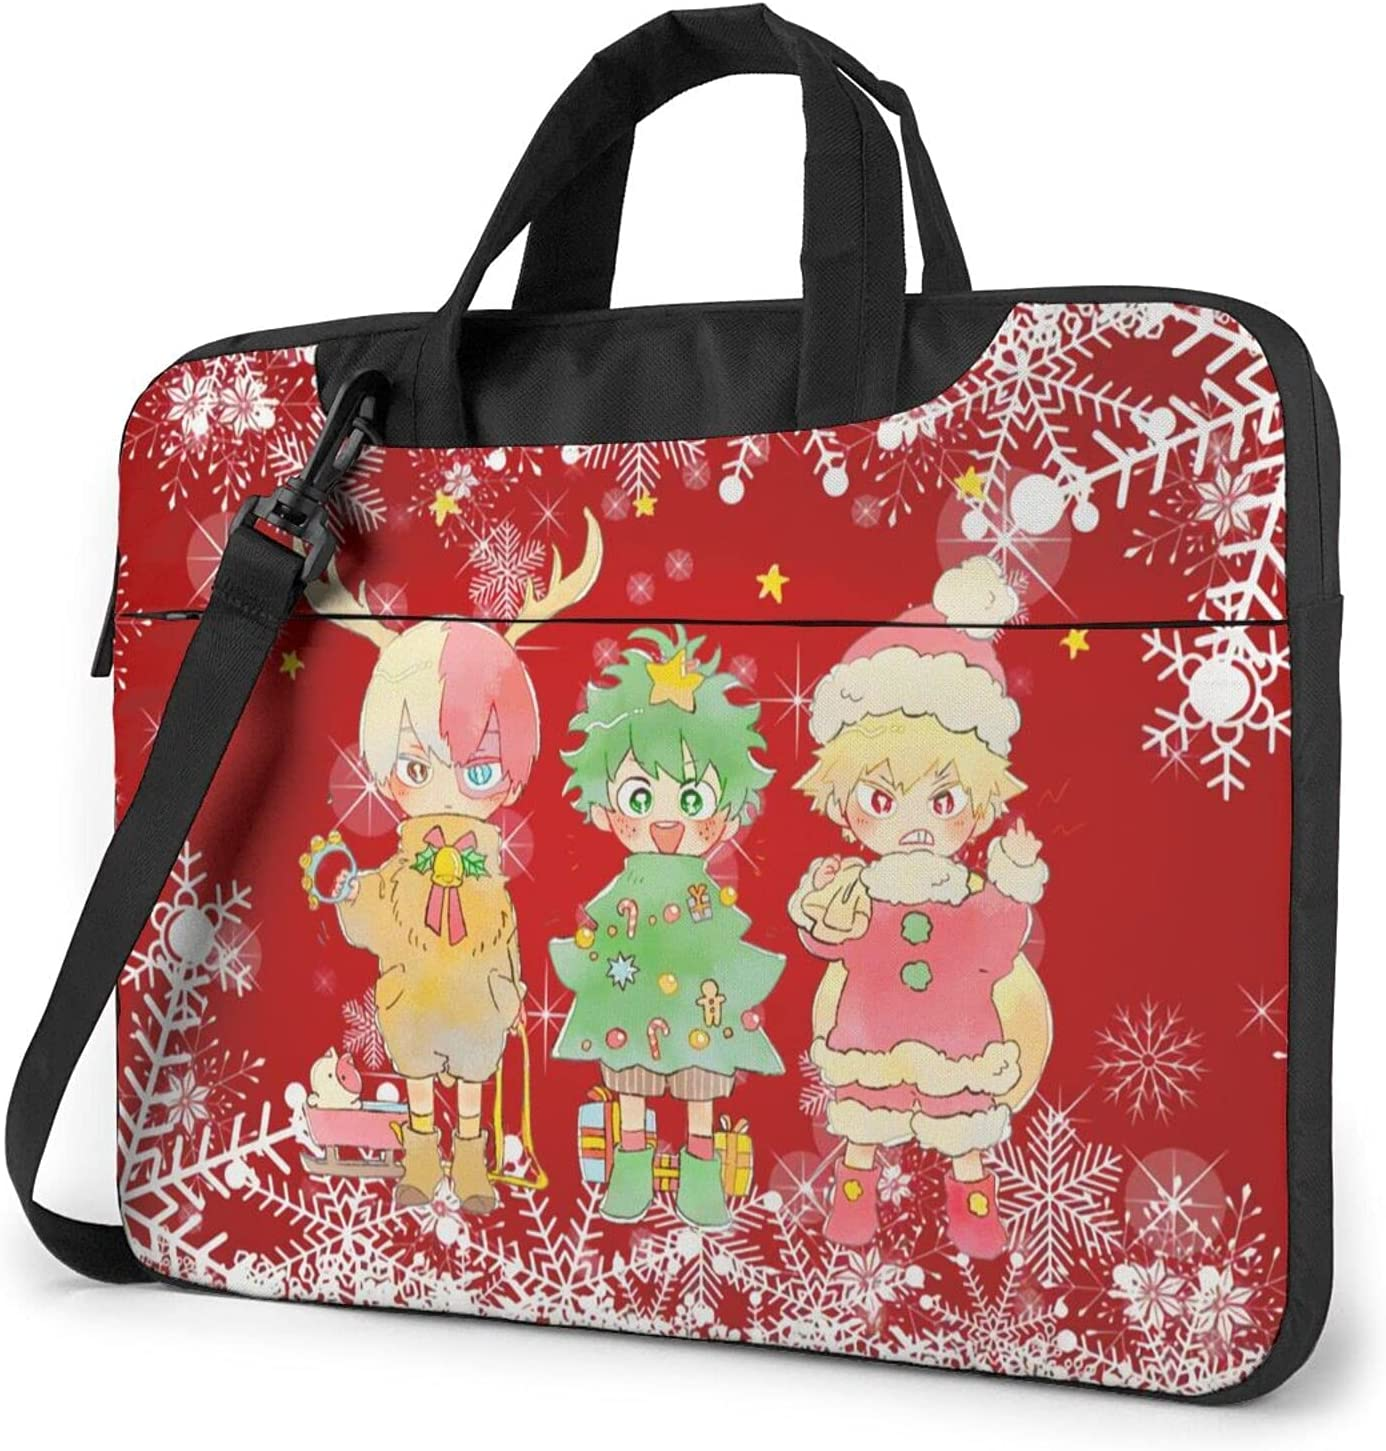 ECHOECVFG My Hero Academia Tododeku Navidad Jacksonville Mall 13 14 Lapt inch Max 80% OFF